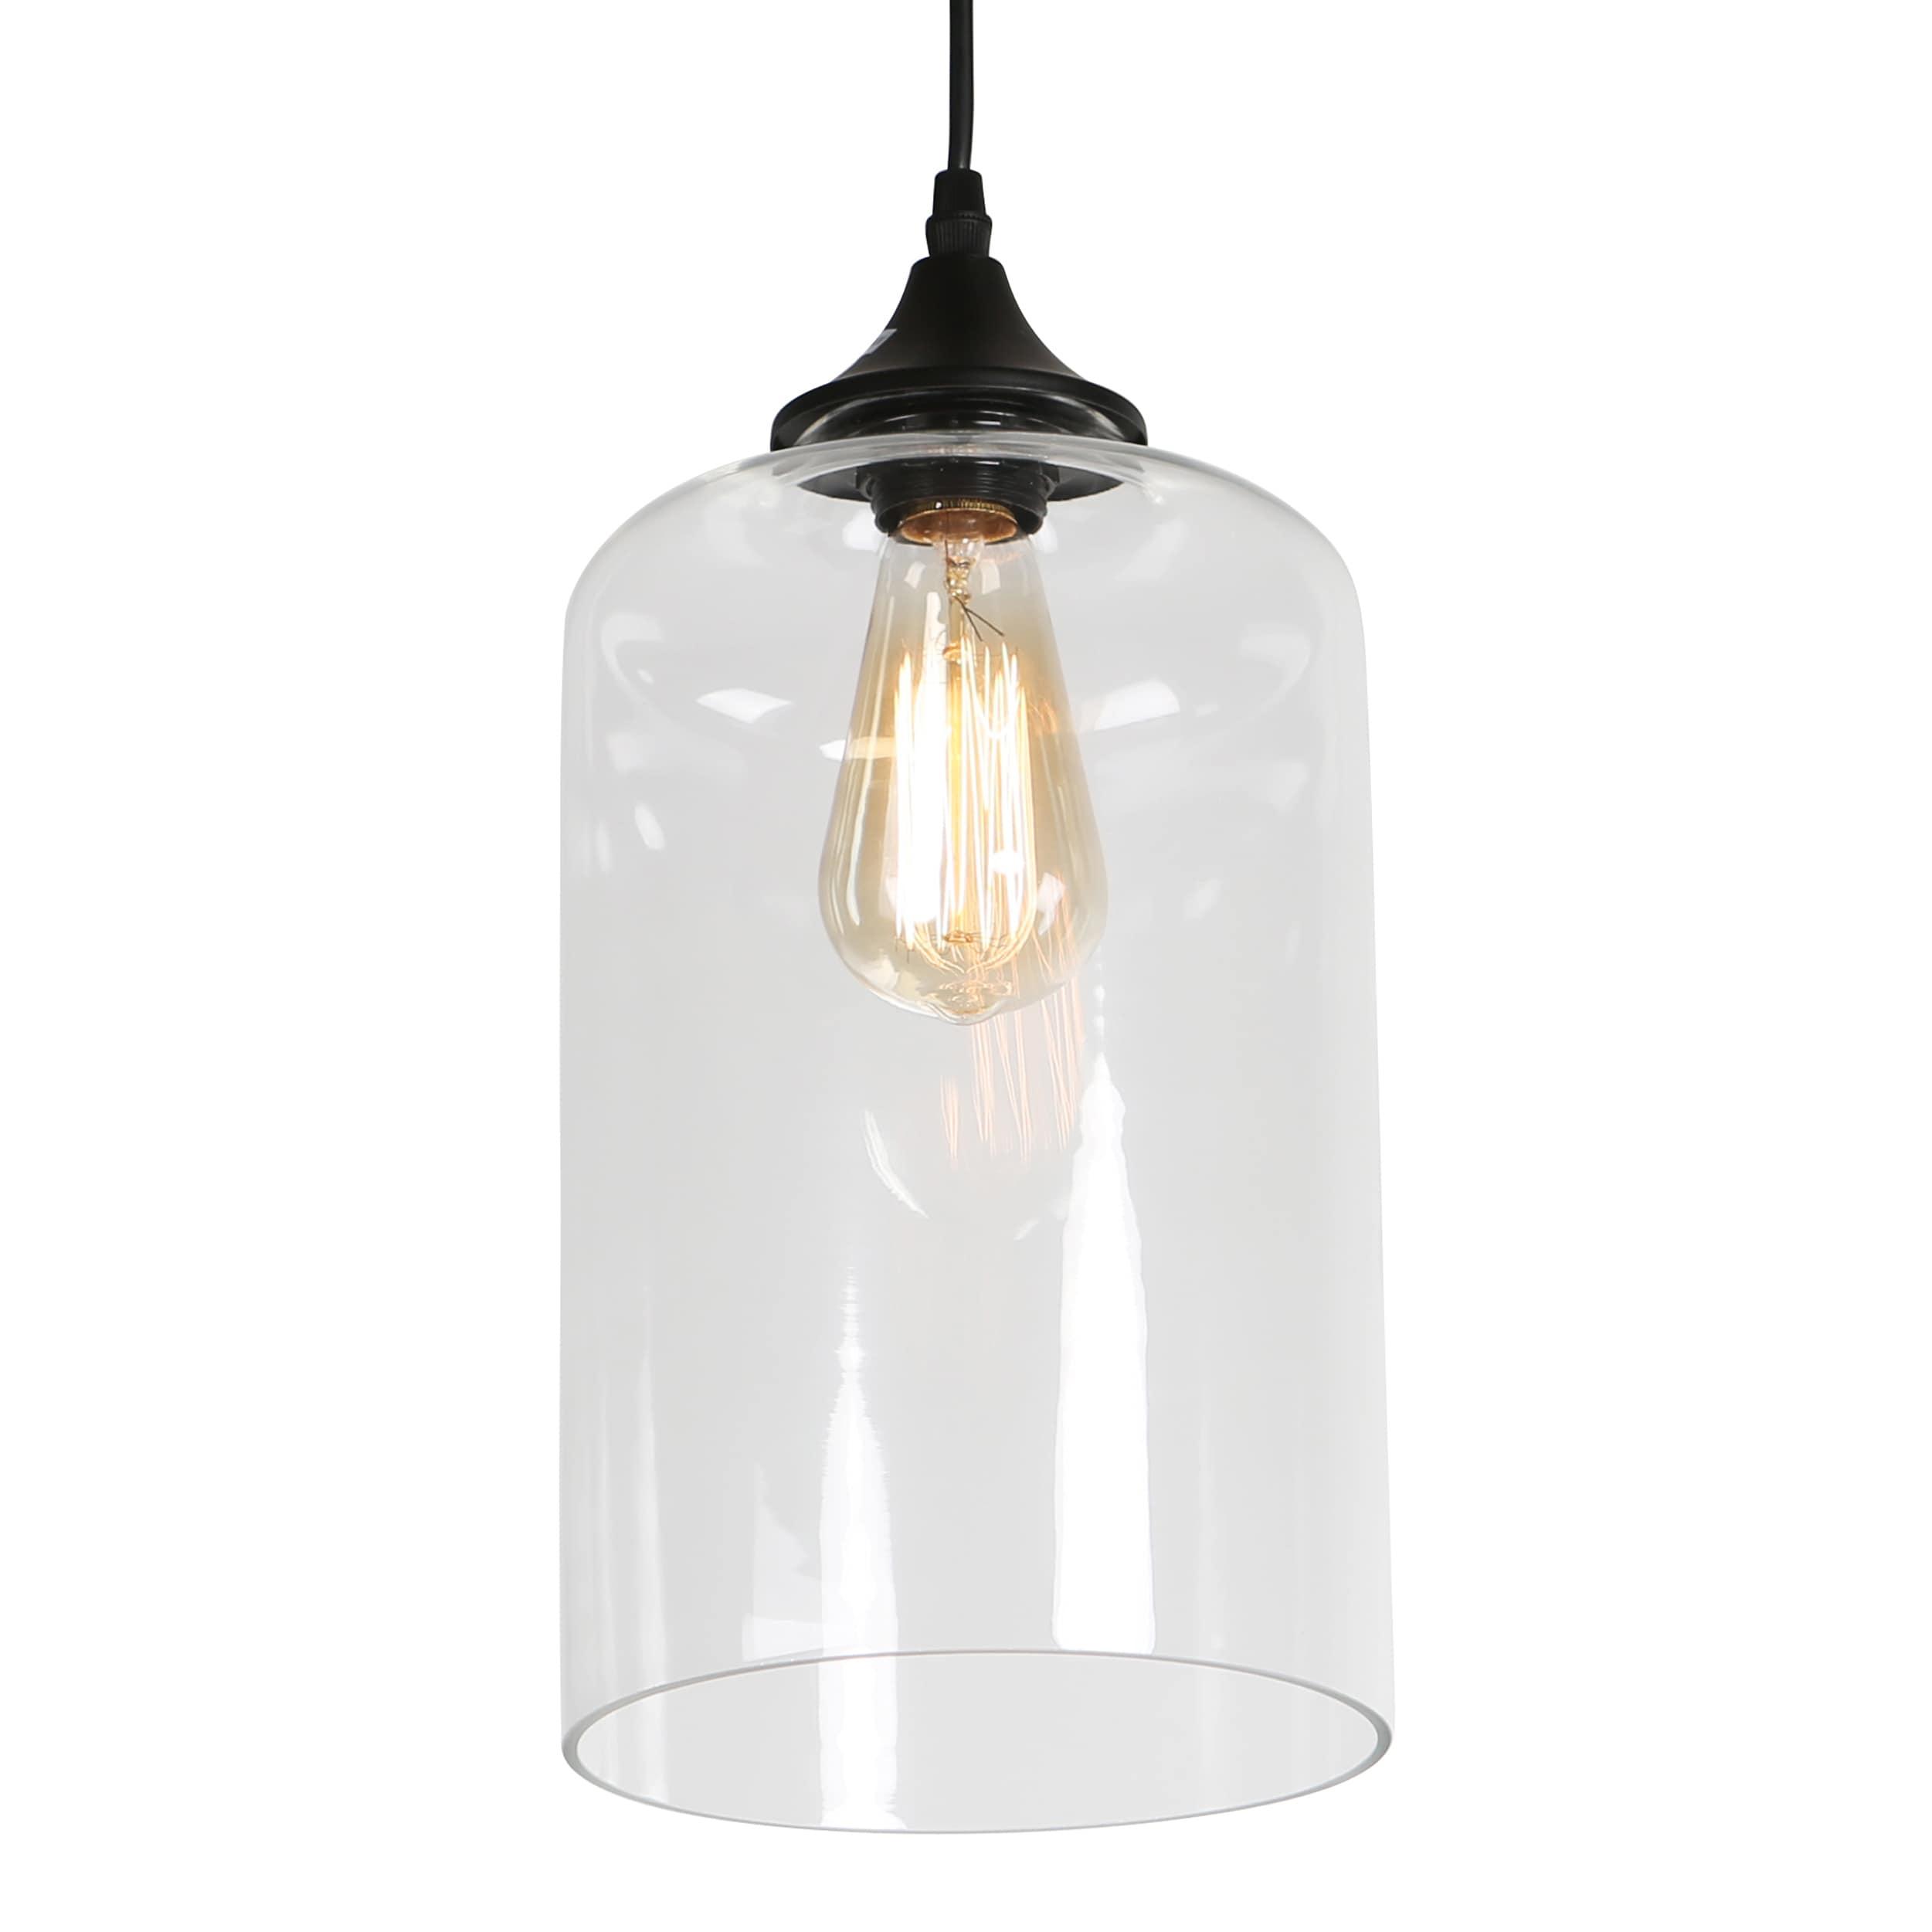 journee lighting. Journee Home \u0027Leggero\u0027 12 In Hard Wired Glass Pendant Light With Included Edison Bulb - Free Shipping Today Overstock 24186466 Lighting 0